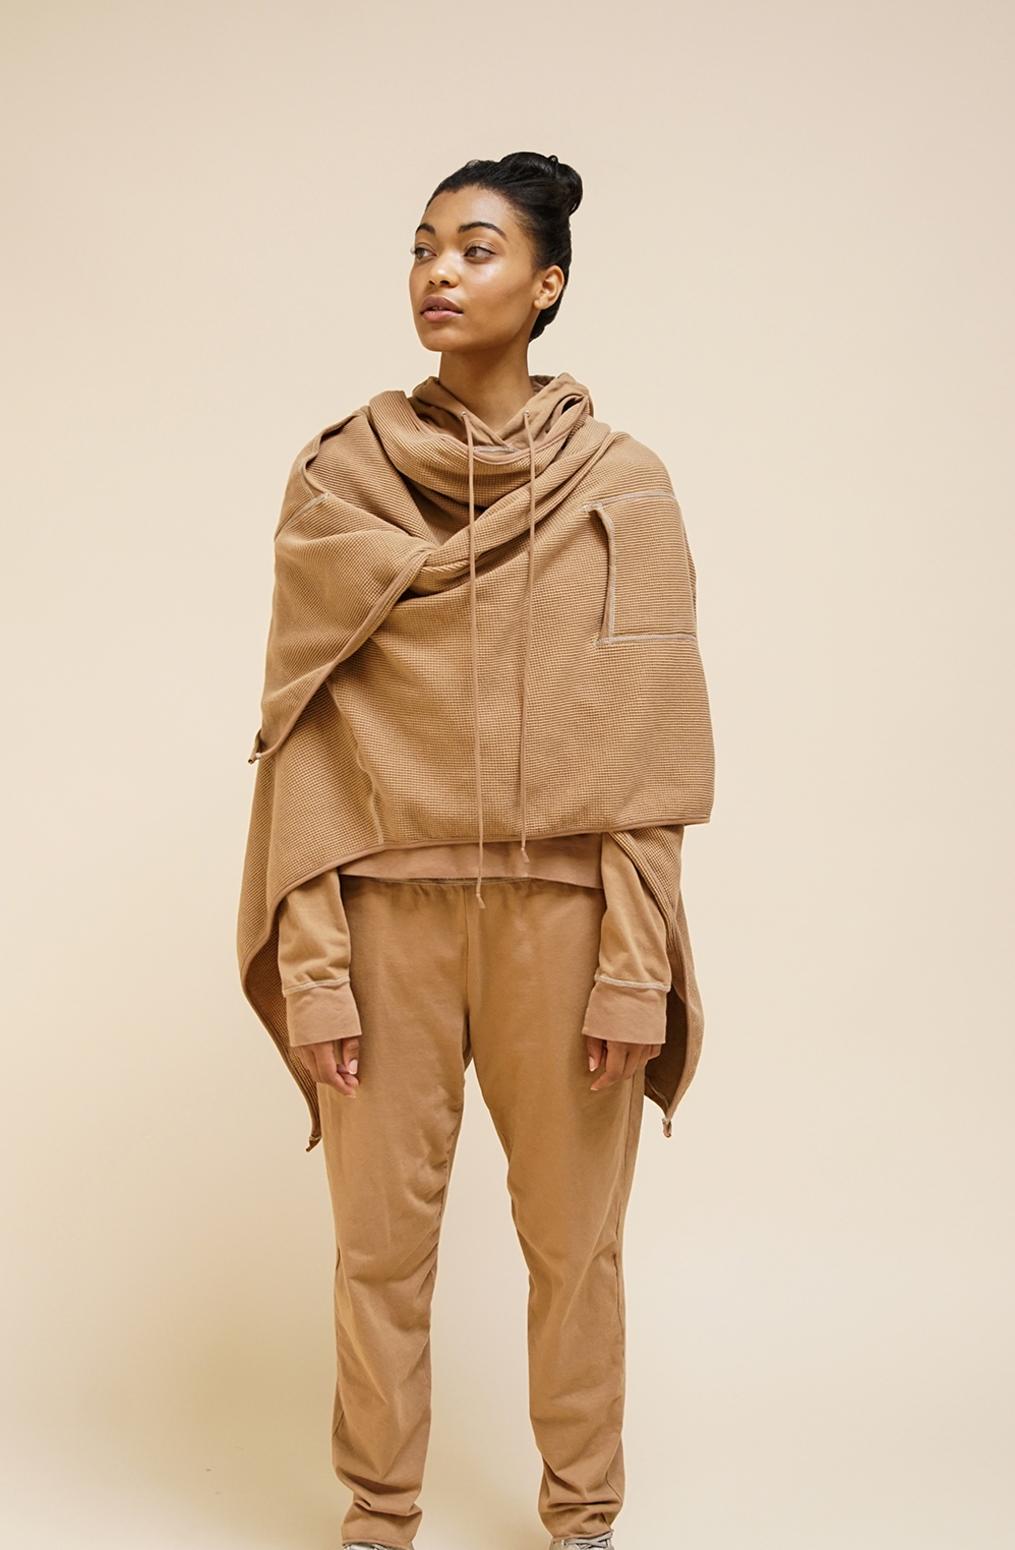 Alabama chanin womens organic cotton hoodie leisurewear 2